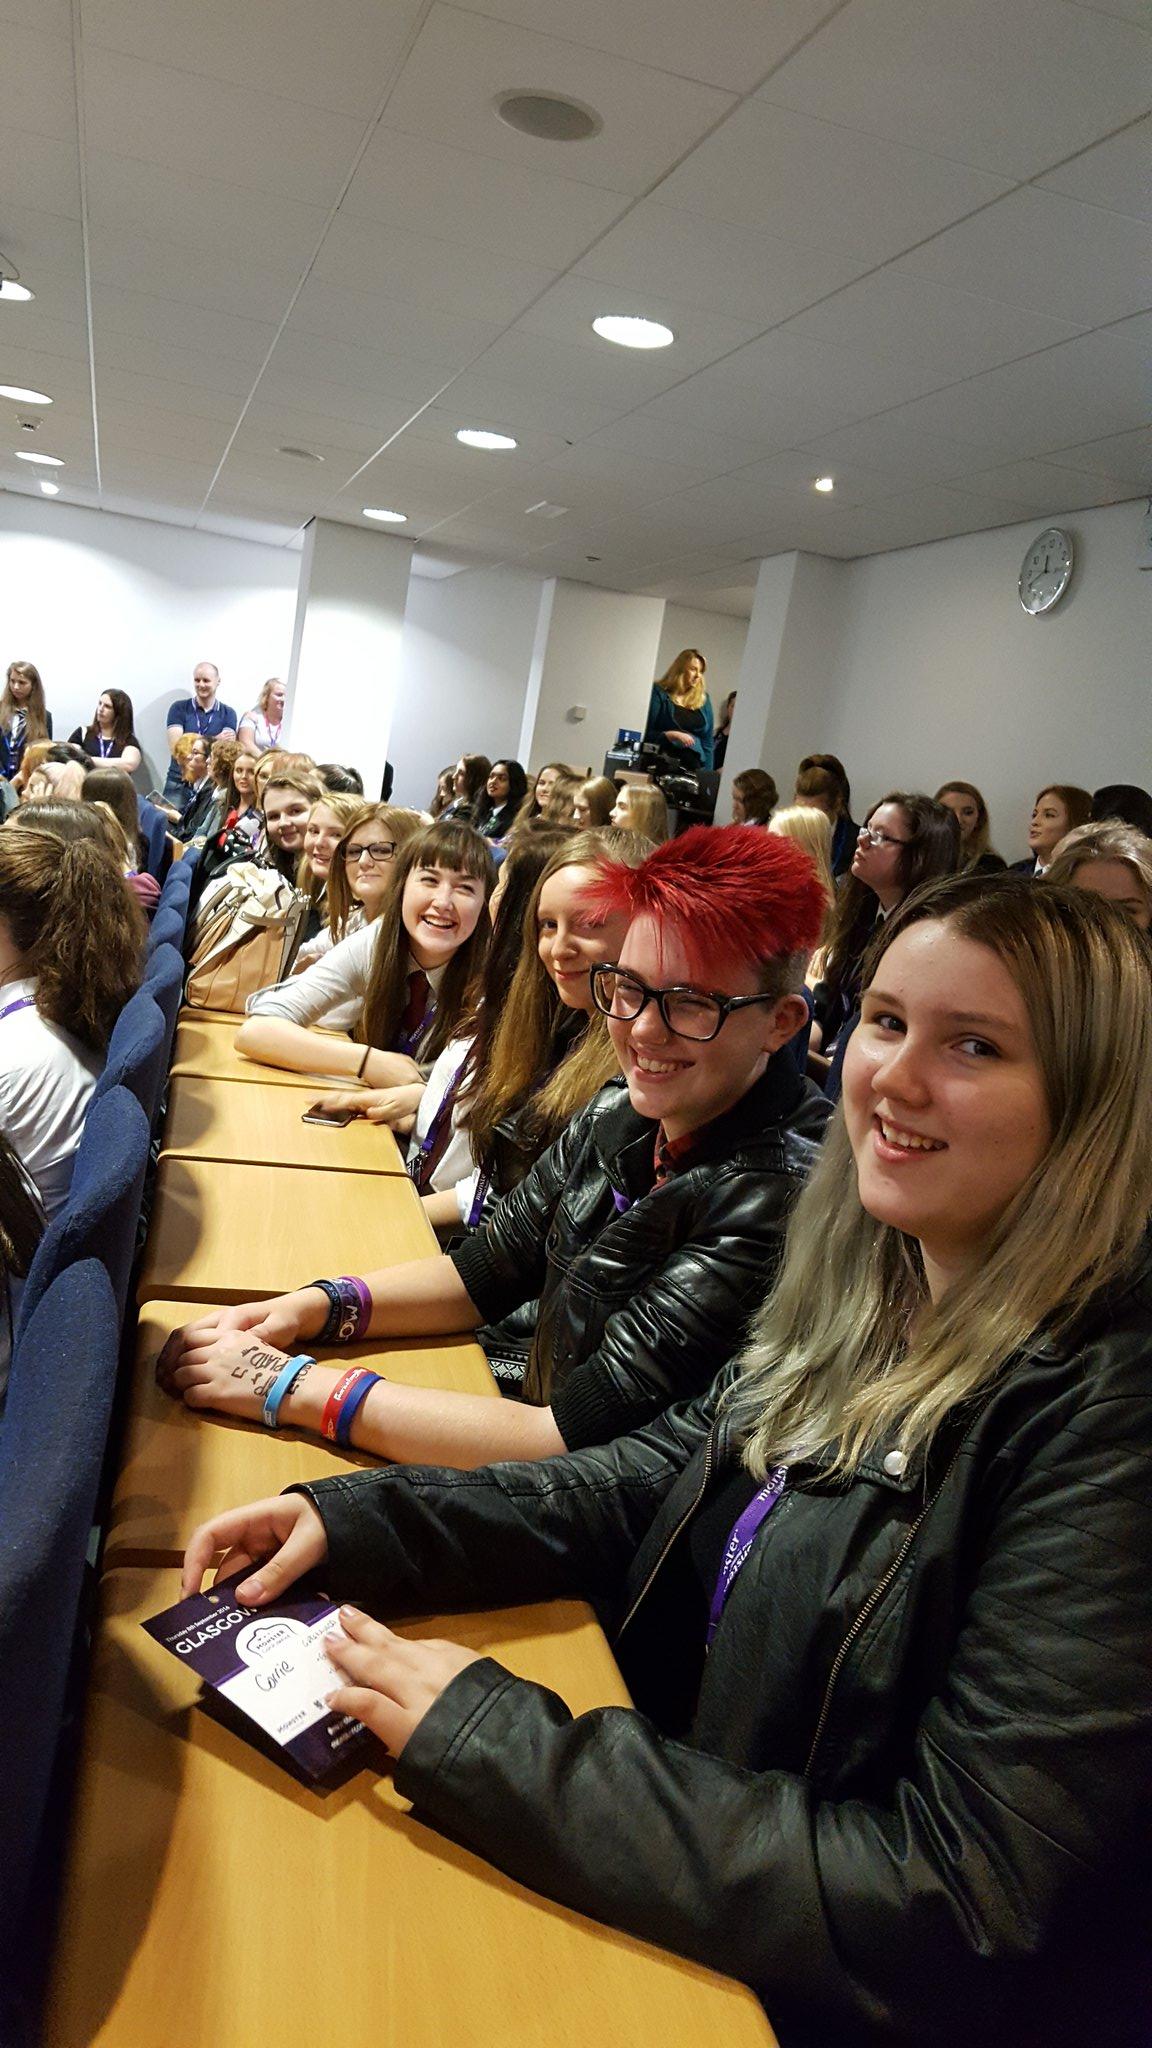 @Greenwood_Acad pupils having a great time at Glasgow University #monsterconfidence #WomenInSTEM https://t.co/PRronrhlpJ